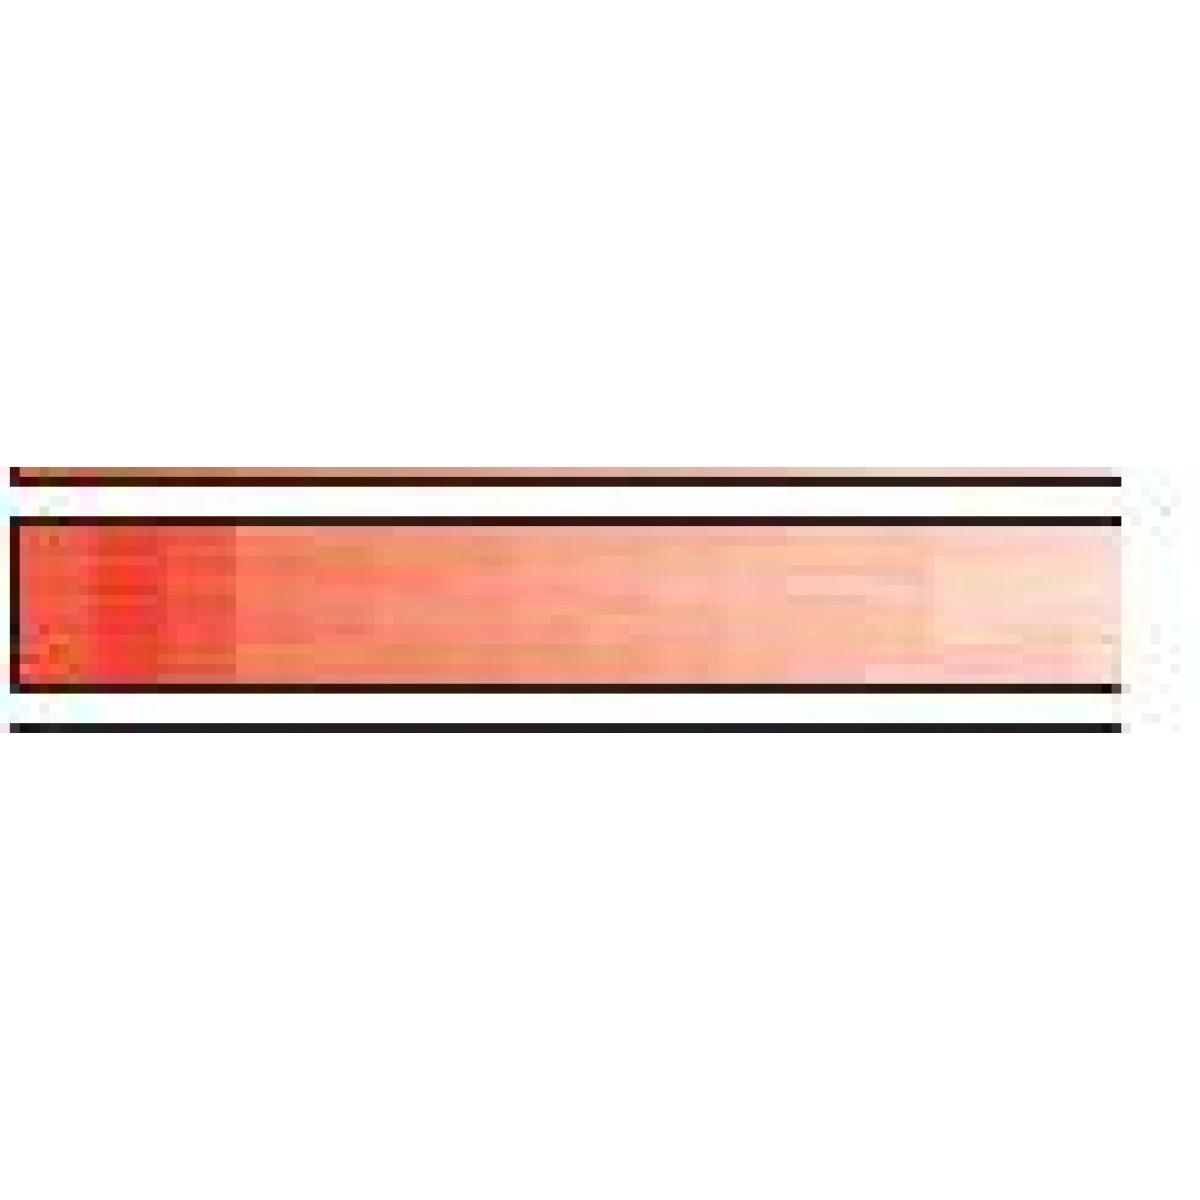 85103 Kunstnerkvalitet soft pastel Cadmium red ligh